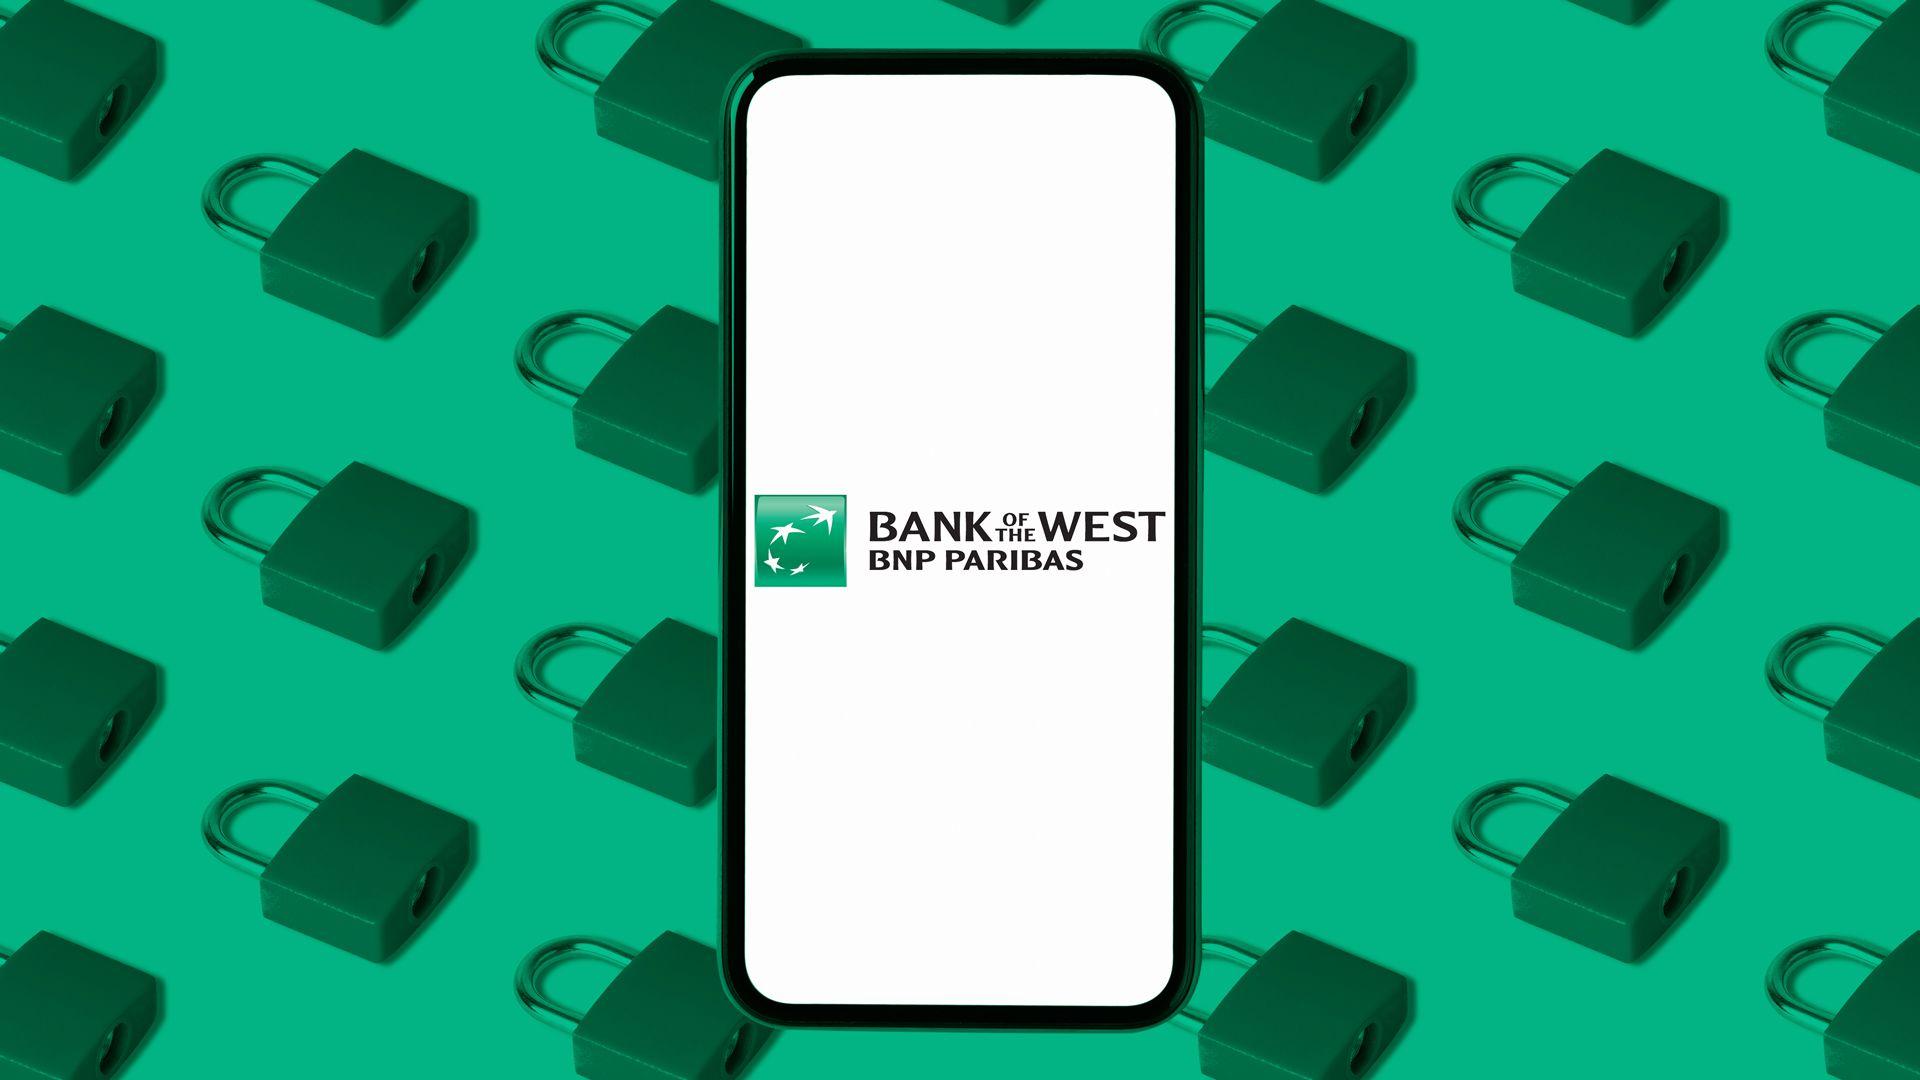 Bank of the West BNP Paribas bank login